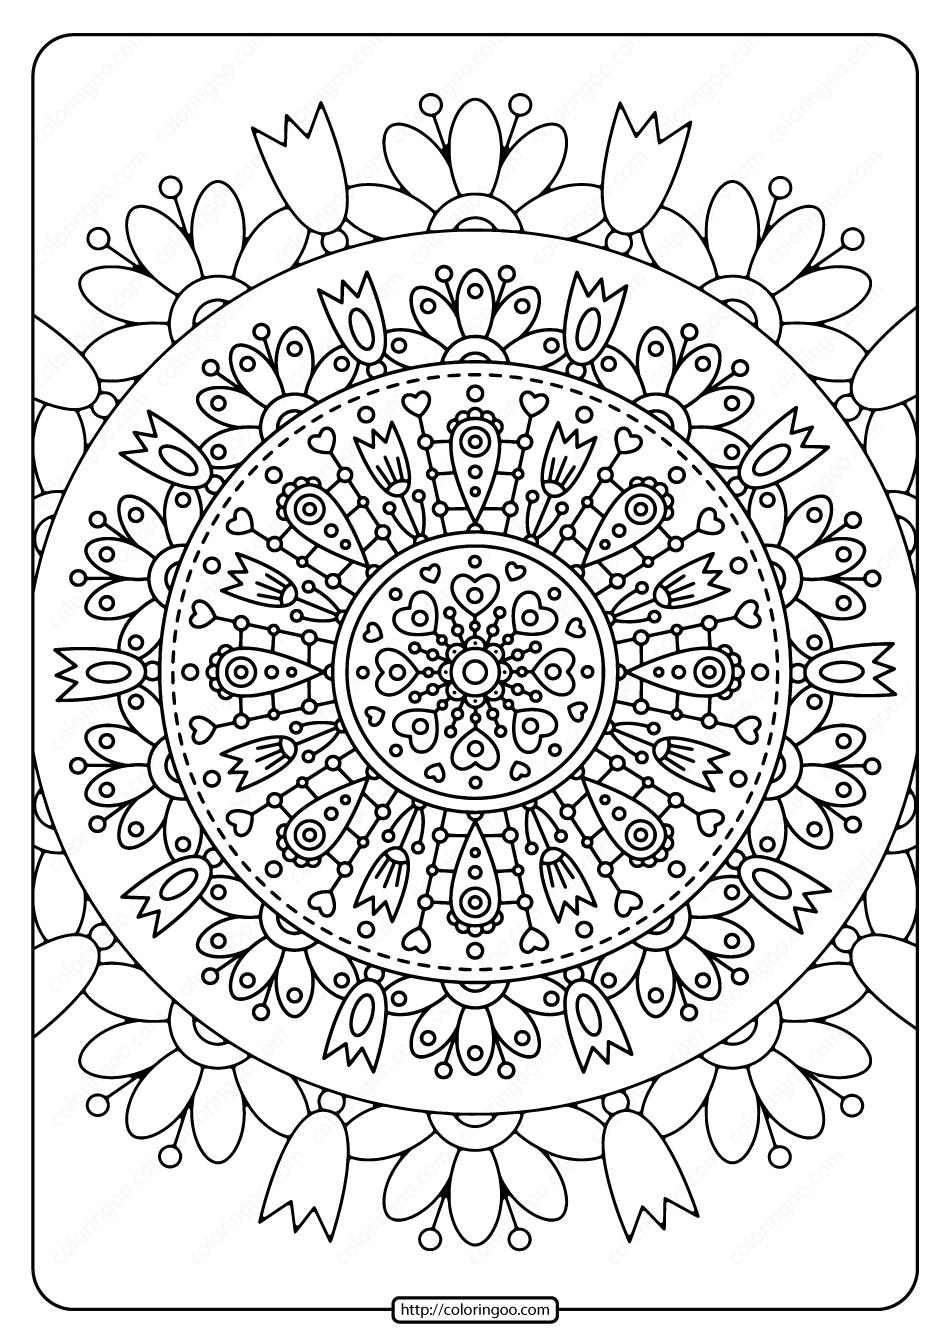 Printable Spring Mandala Pdf Coloring Page Coloring Pages Mandala Coloring Pages Colored Pencil Drawing Techniques